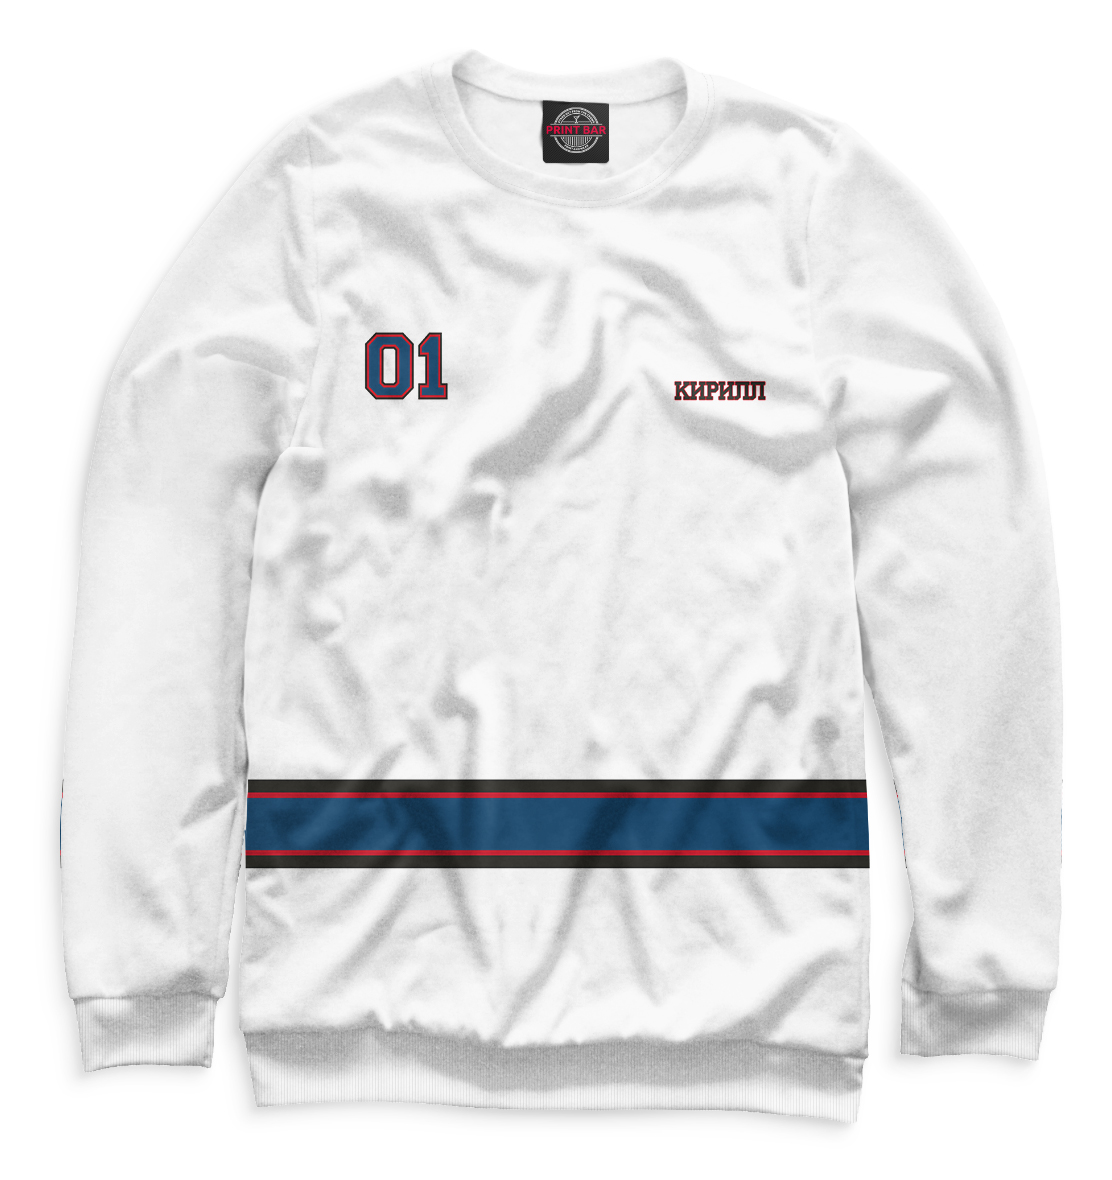 Купить Хоккеист Кирилл, Printbar, Свитшоты, KIR-581338-swi-1